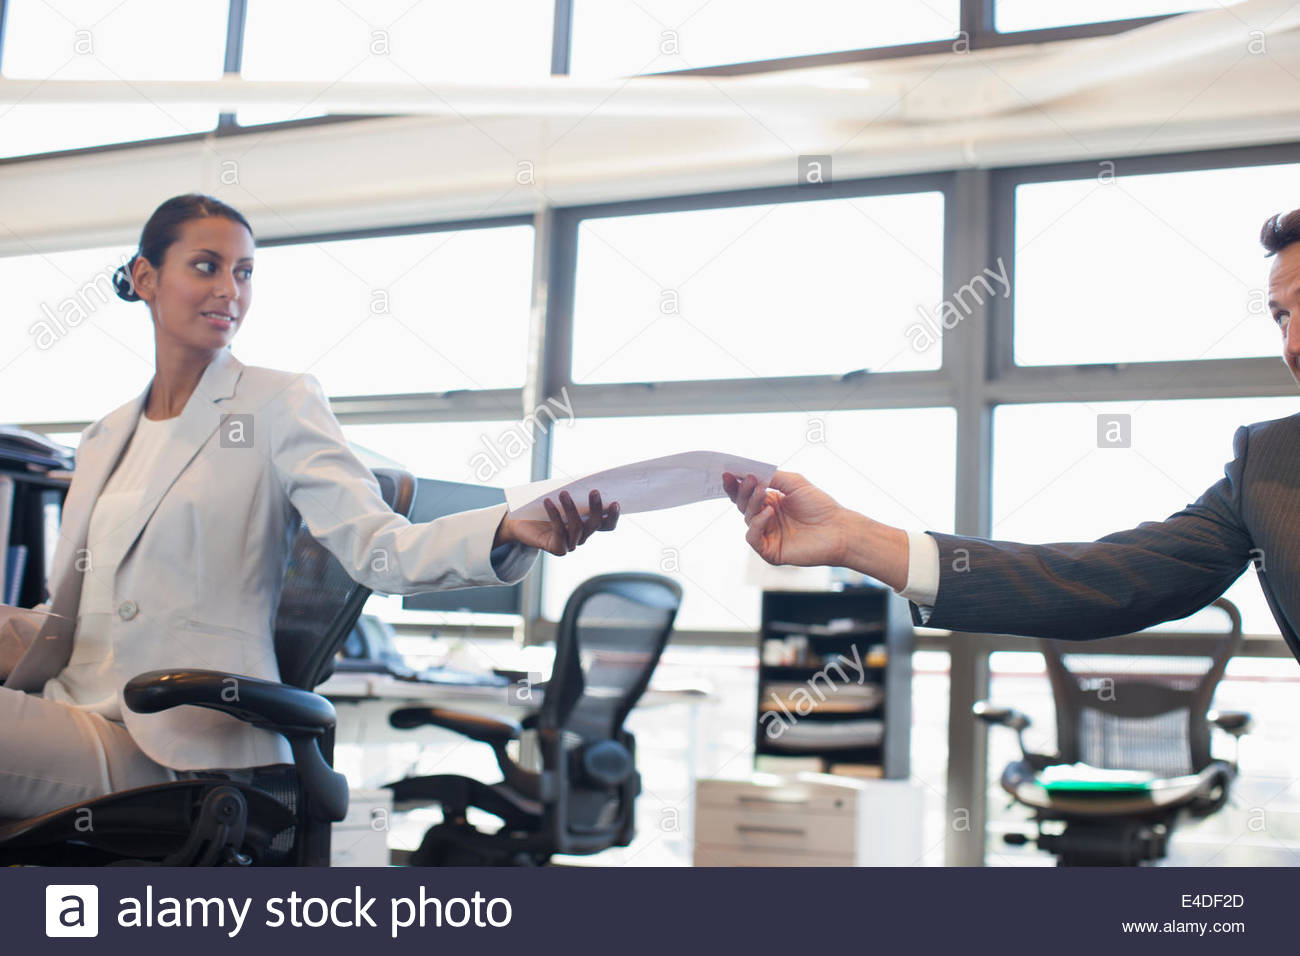 Businessman handing co-worker paperwork in office - Stock Image